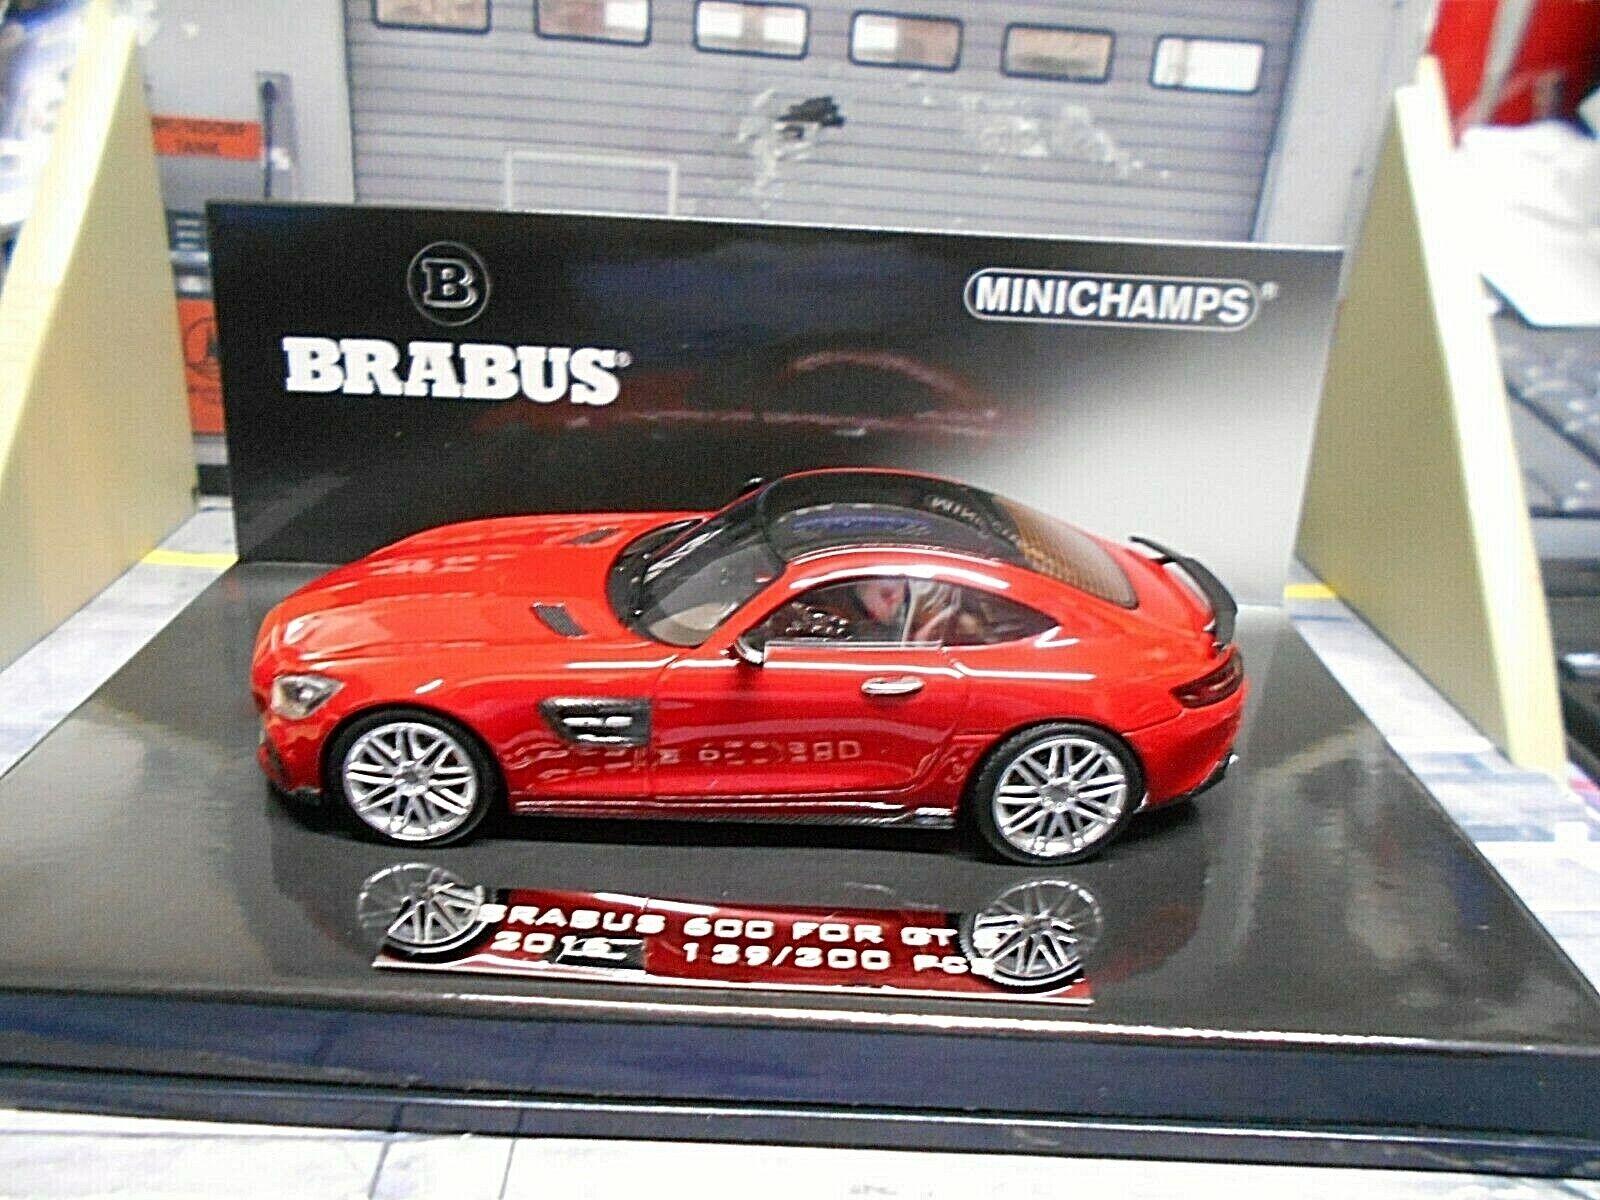 MERCEDES BENZ GTS GT S Brabus 600 2016 Coupe rot rot Sonderpreis Minichamps 1 43